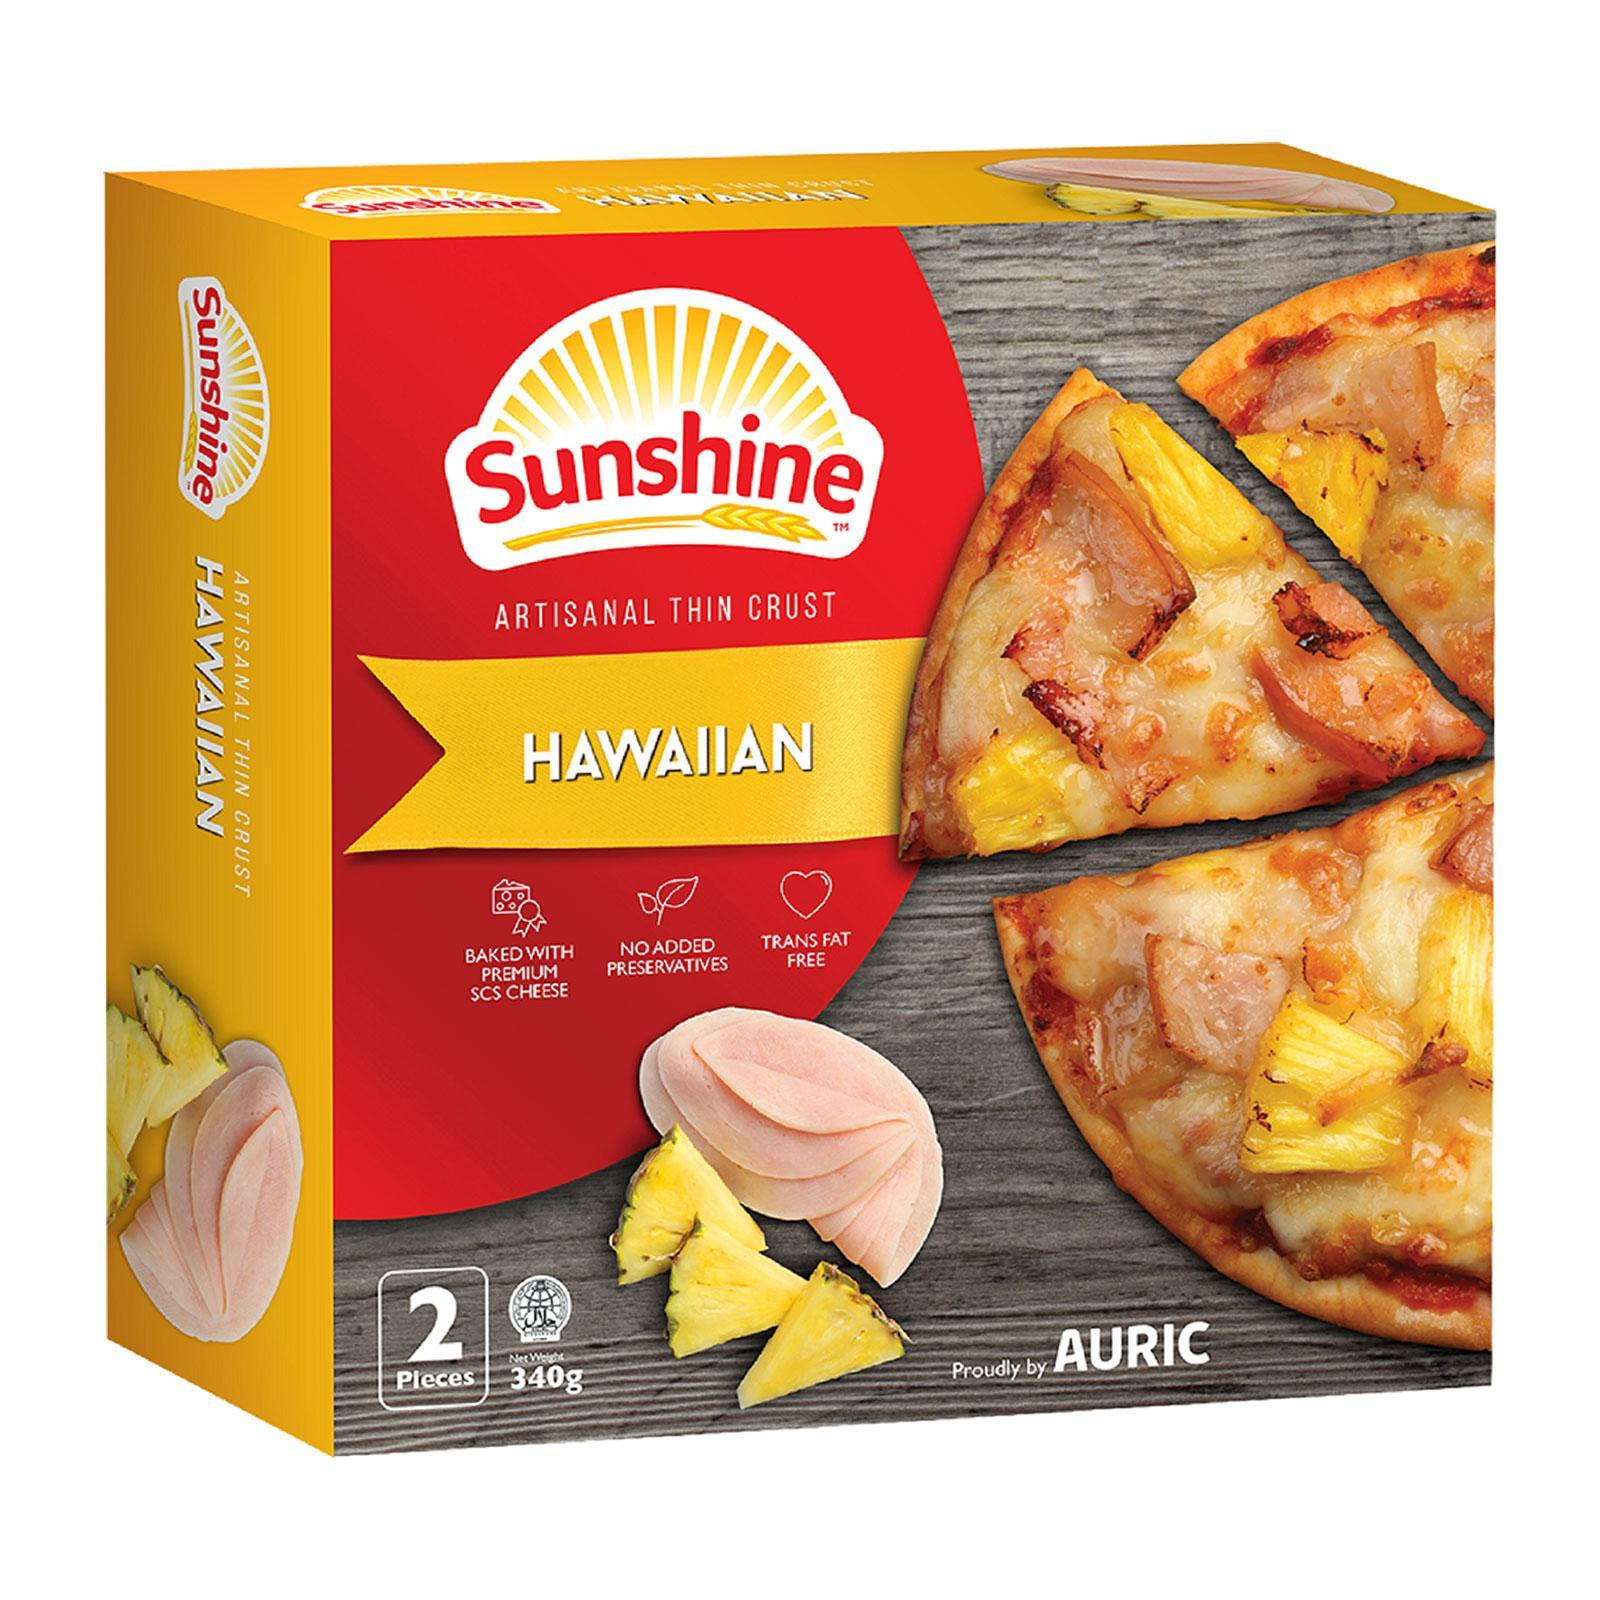 Sunshine Haiwaiian Pizza 6 - Frozen By Redmart.